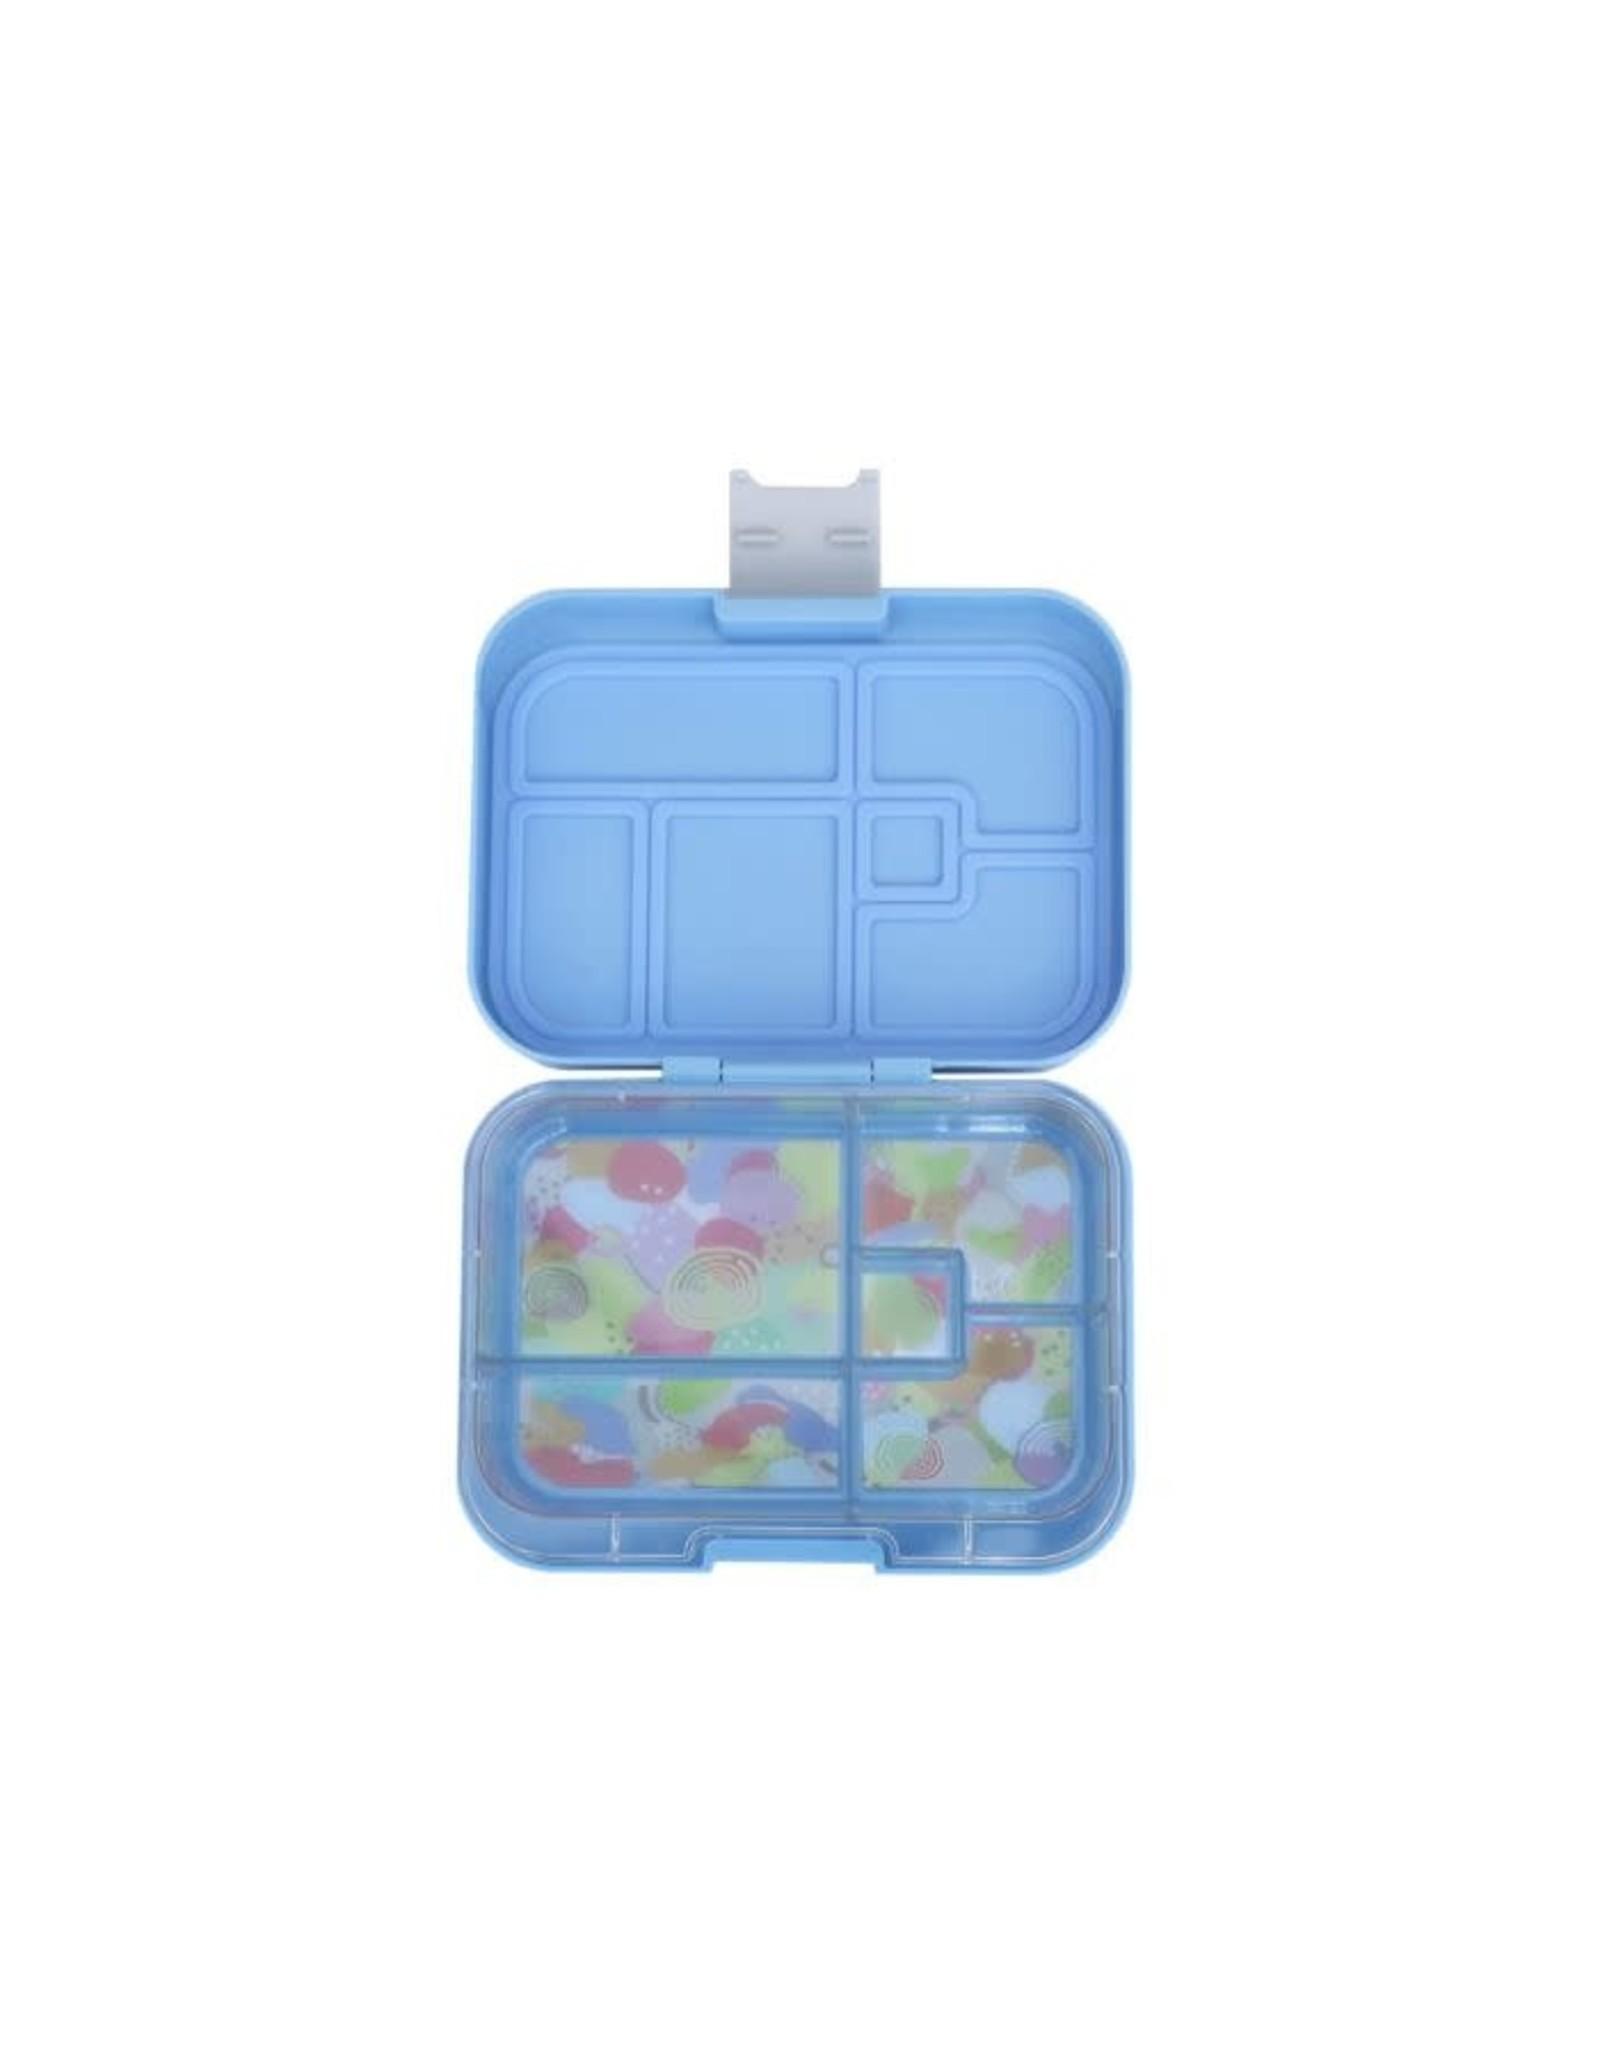 MunchBox MunchBox Midi5, Blue Coco